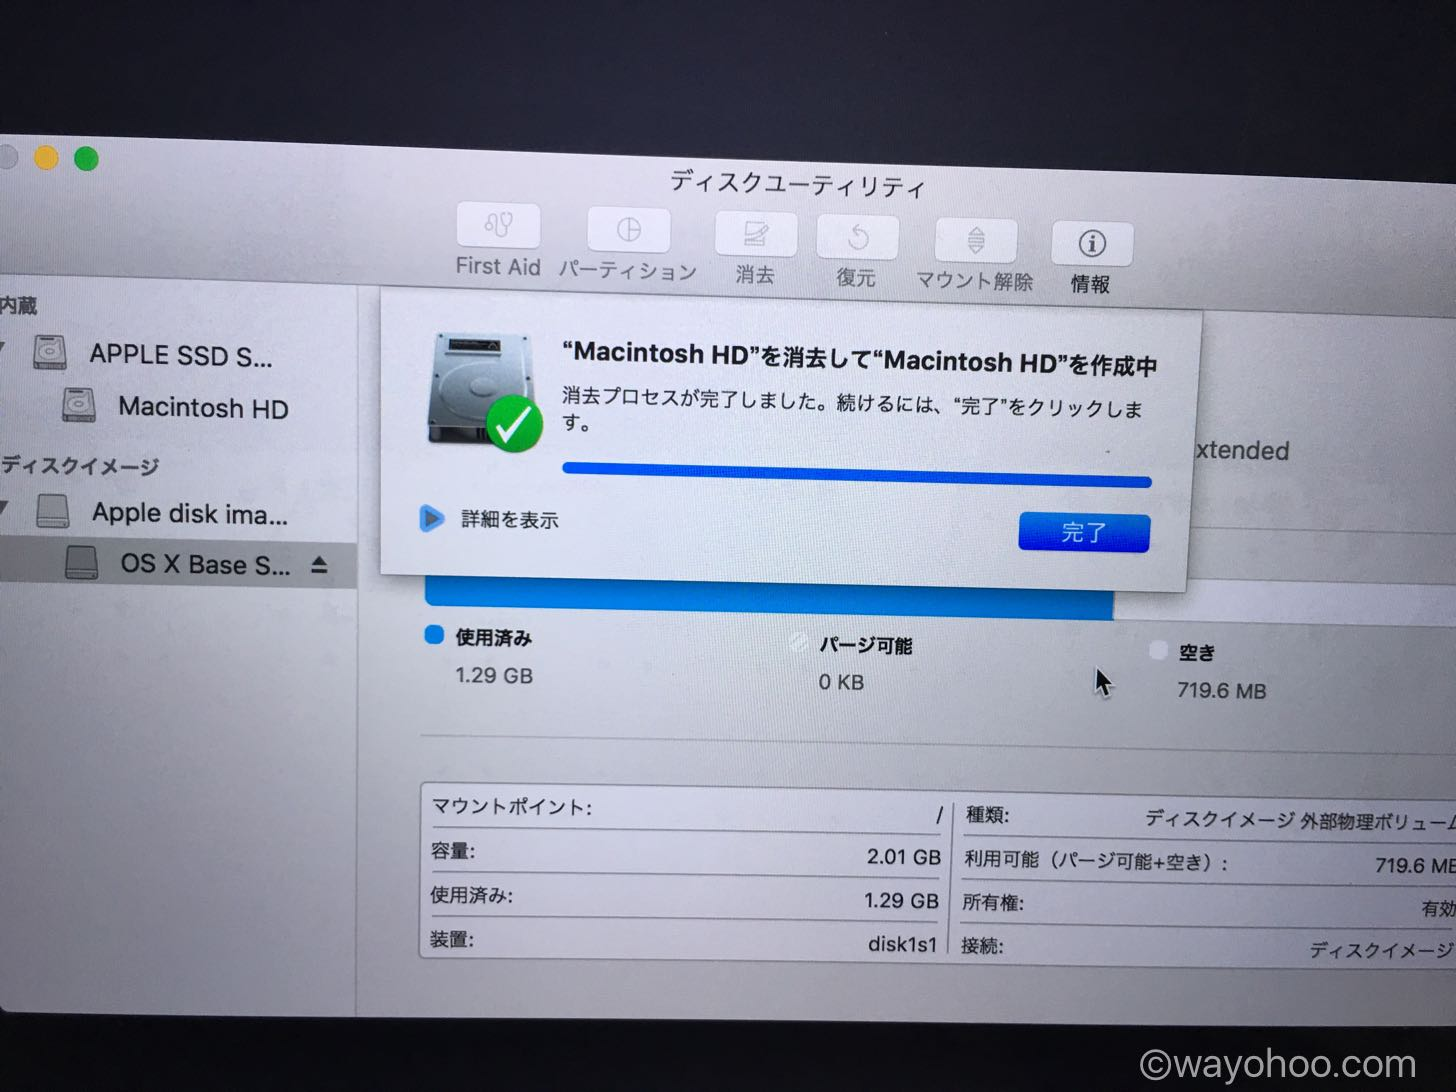 Macintosh HDの消去が完了しました。